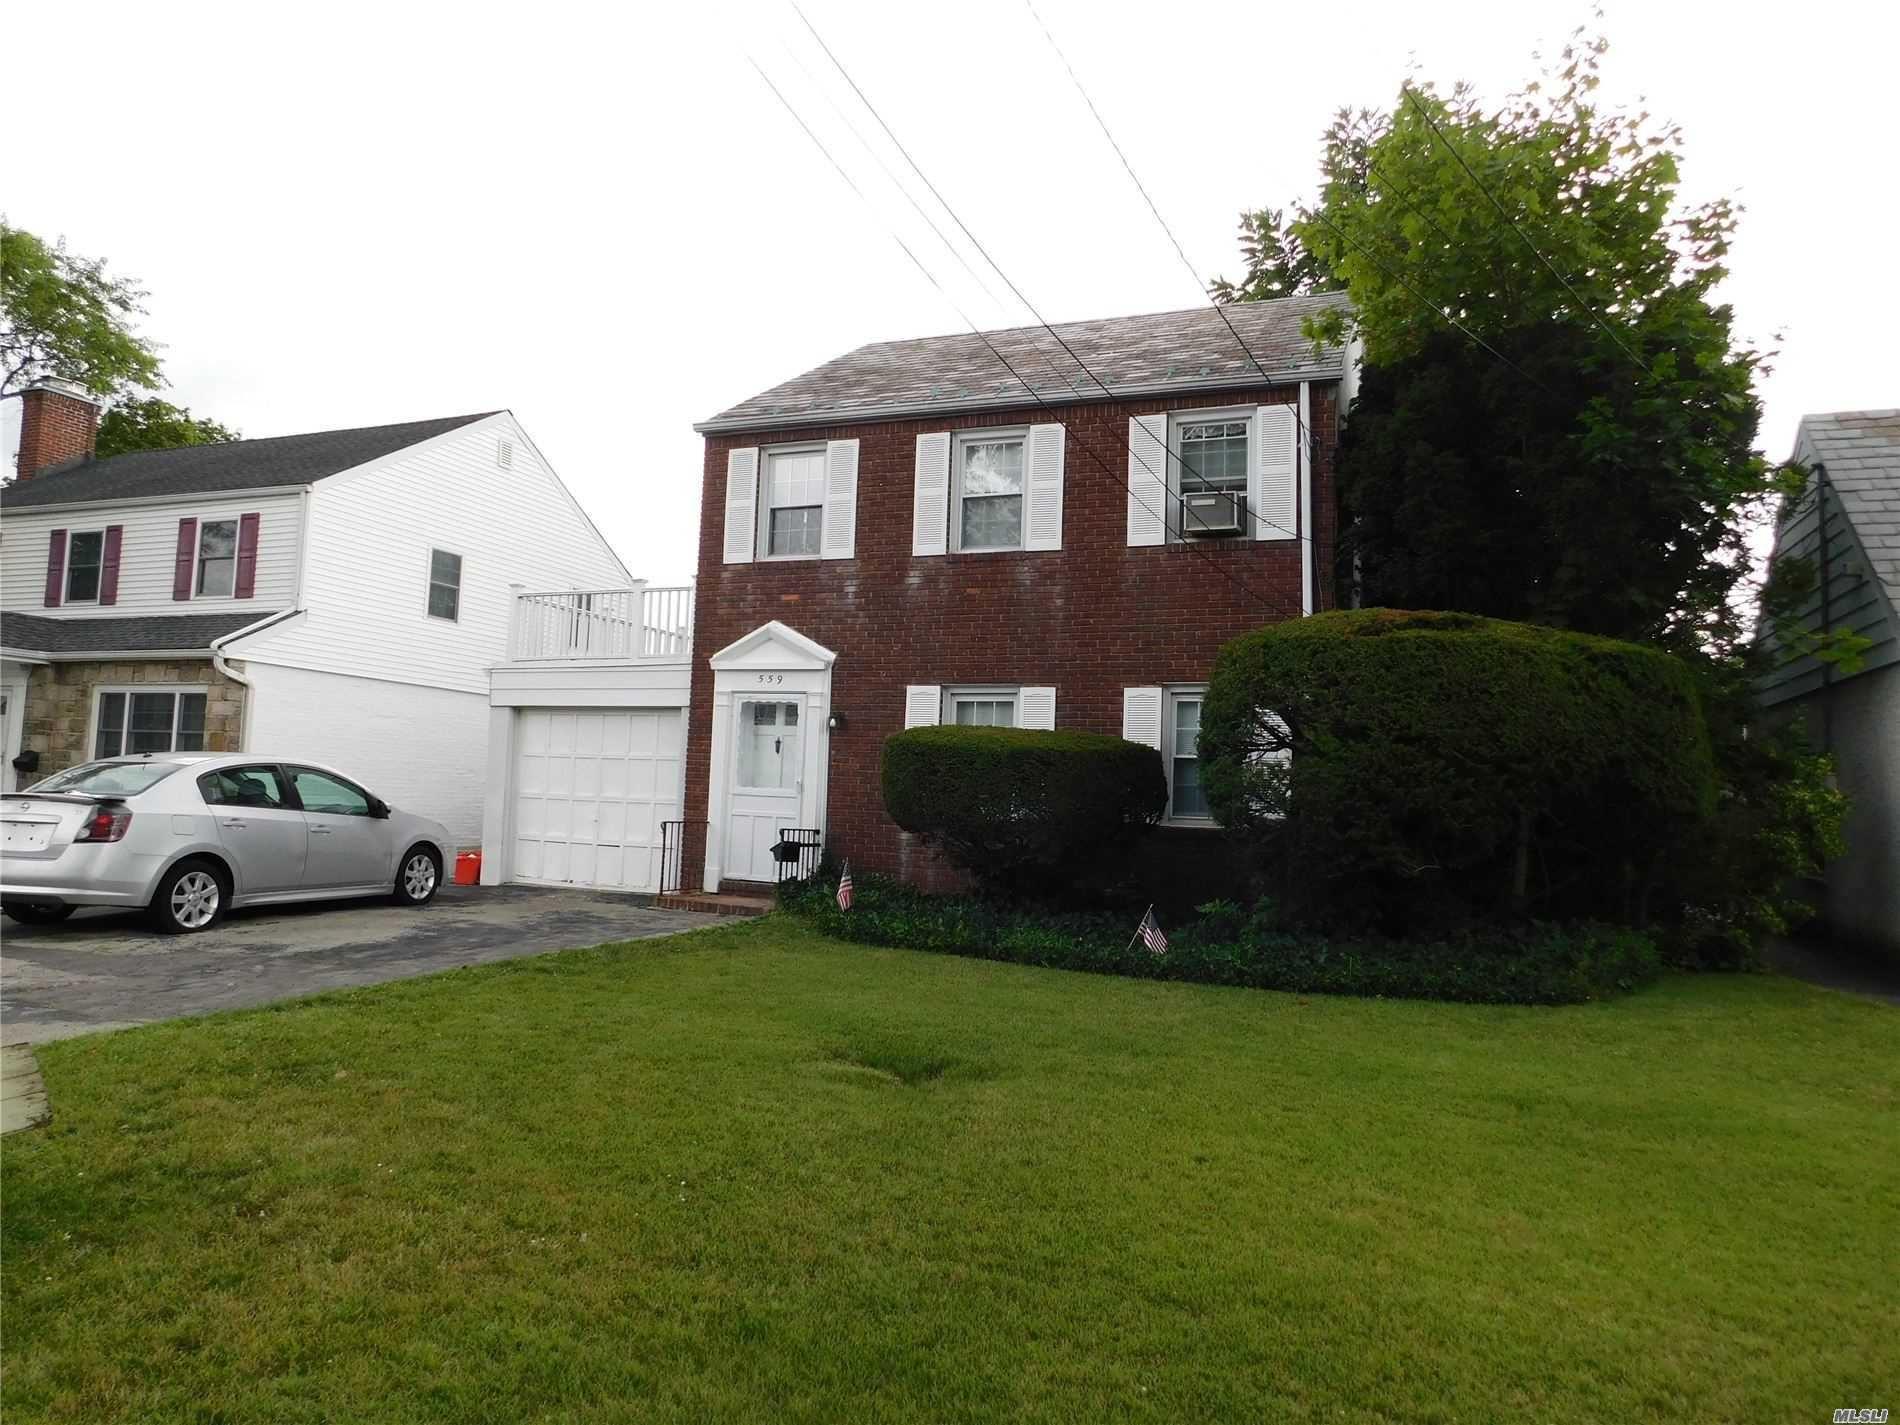 559 Palm Ln, West Hempstead, NY 11552 - MLS#: 3234687